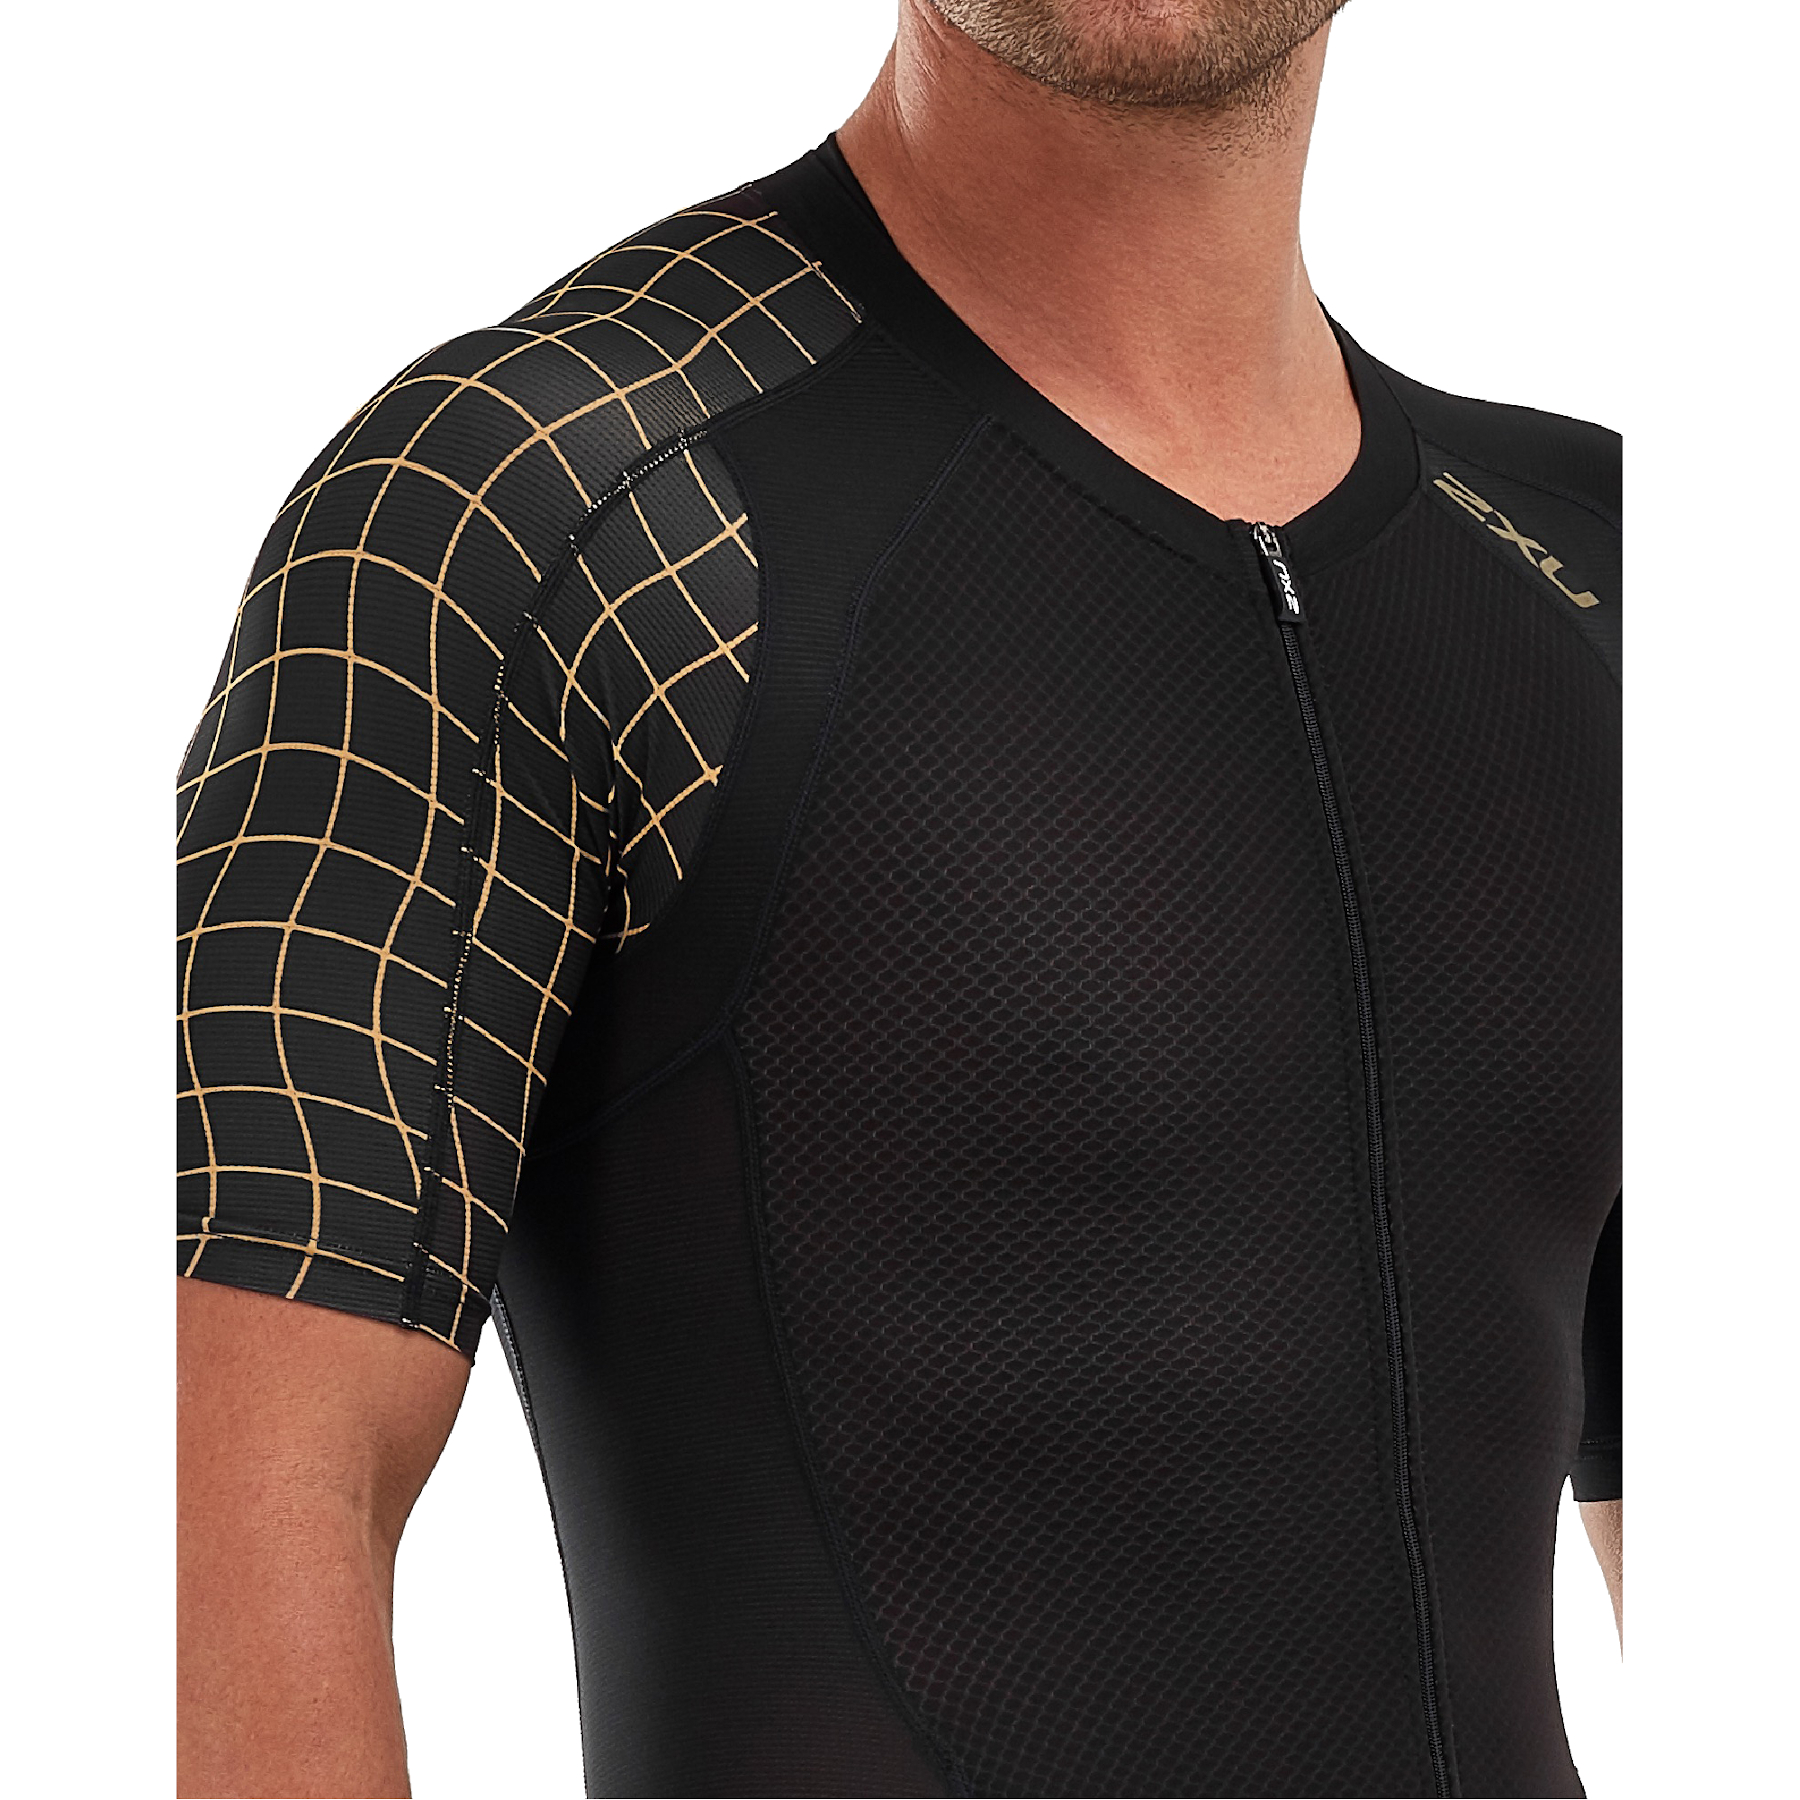 Imagen de 2XU Compression Full Zip Sleeved Trisuit - black/gold